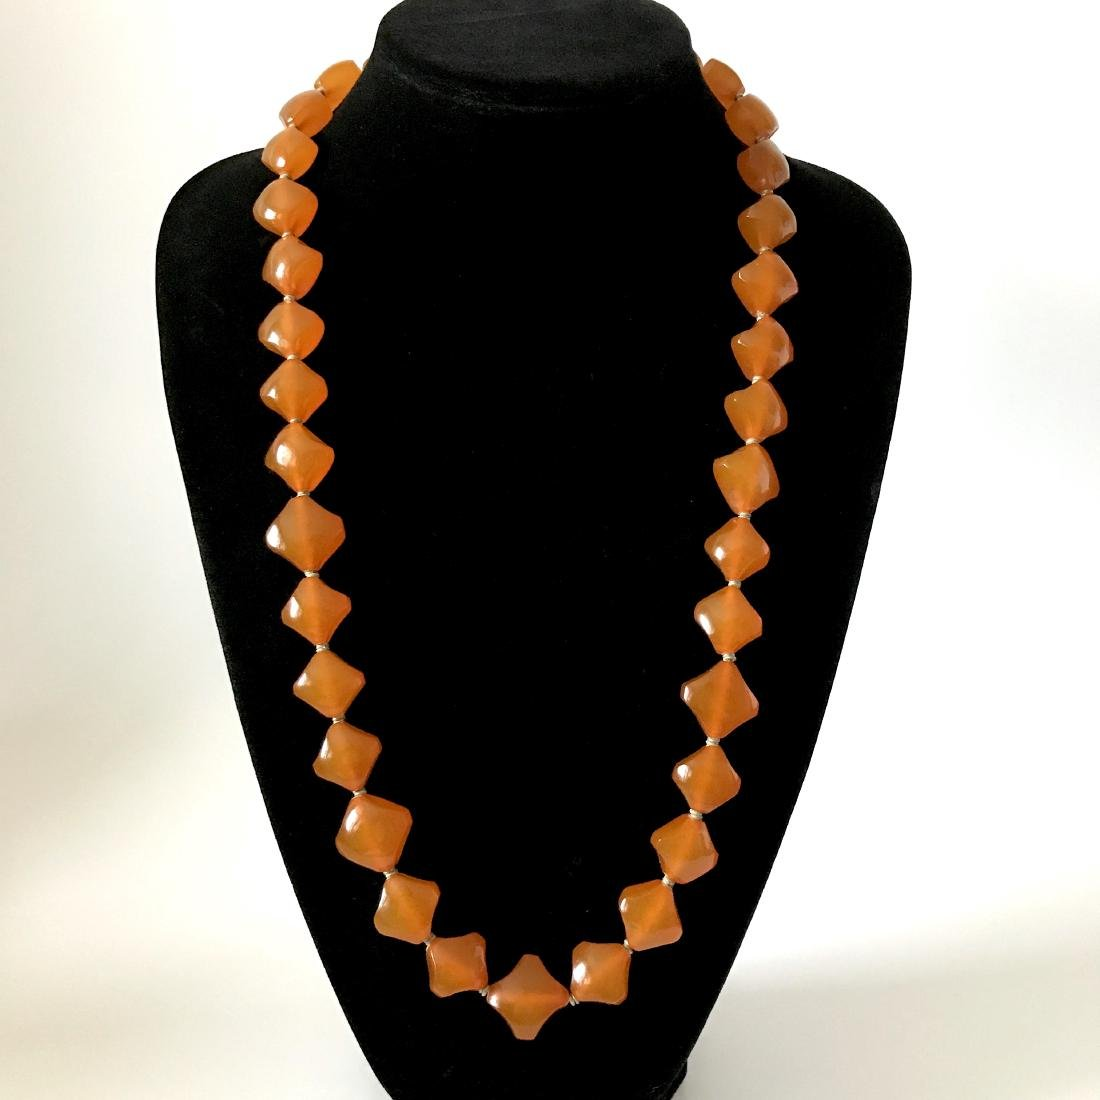 Old Baltic Amber Vintage Necklace Butterscotch Cognac